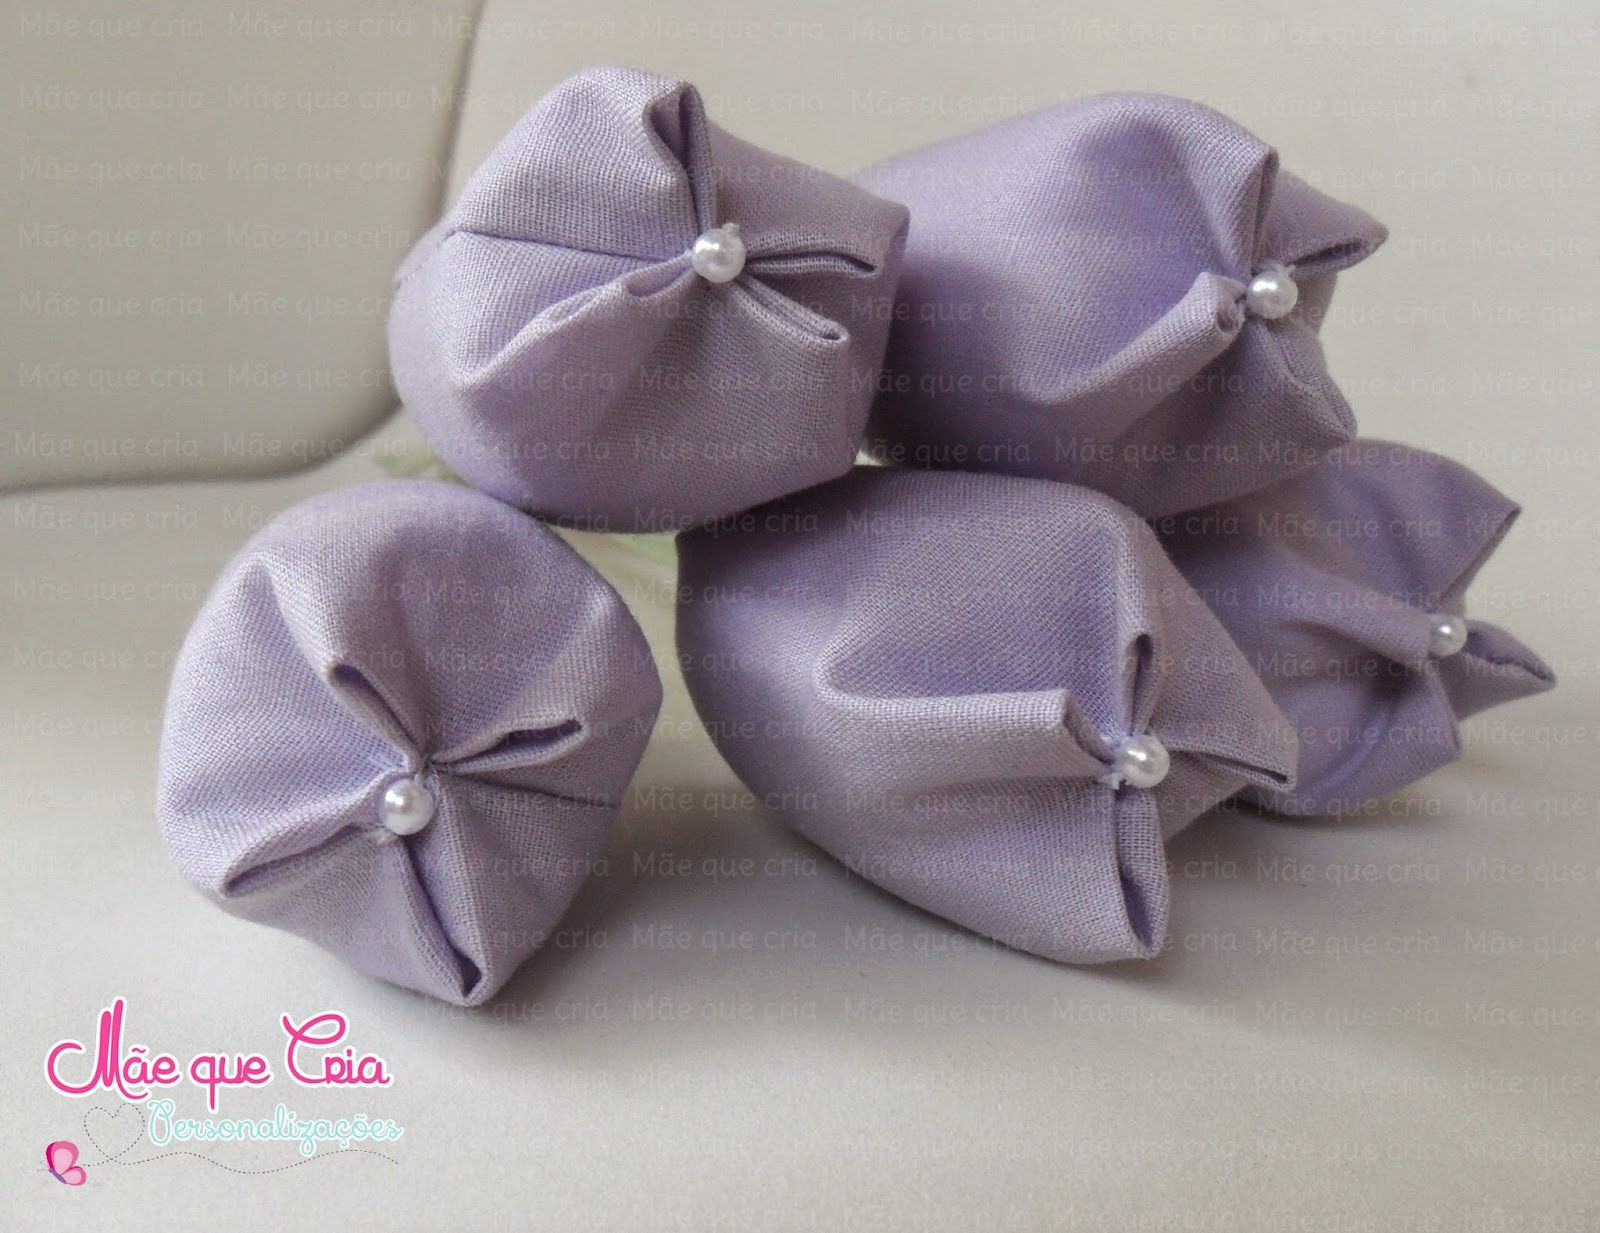 tulipa-de-tecido-lilás